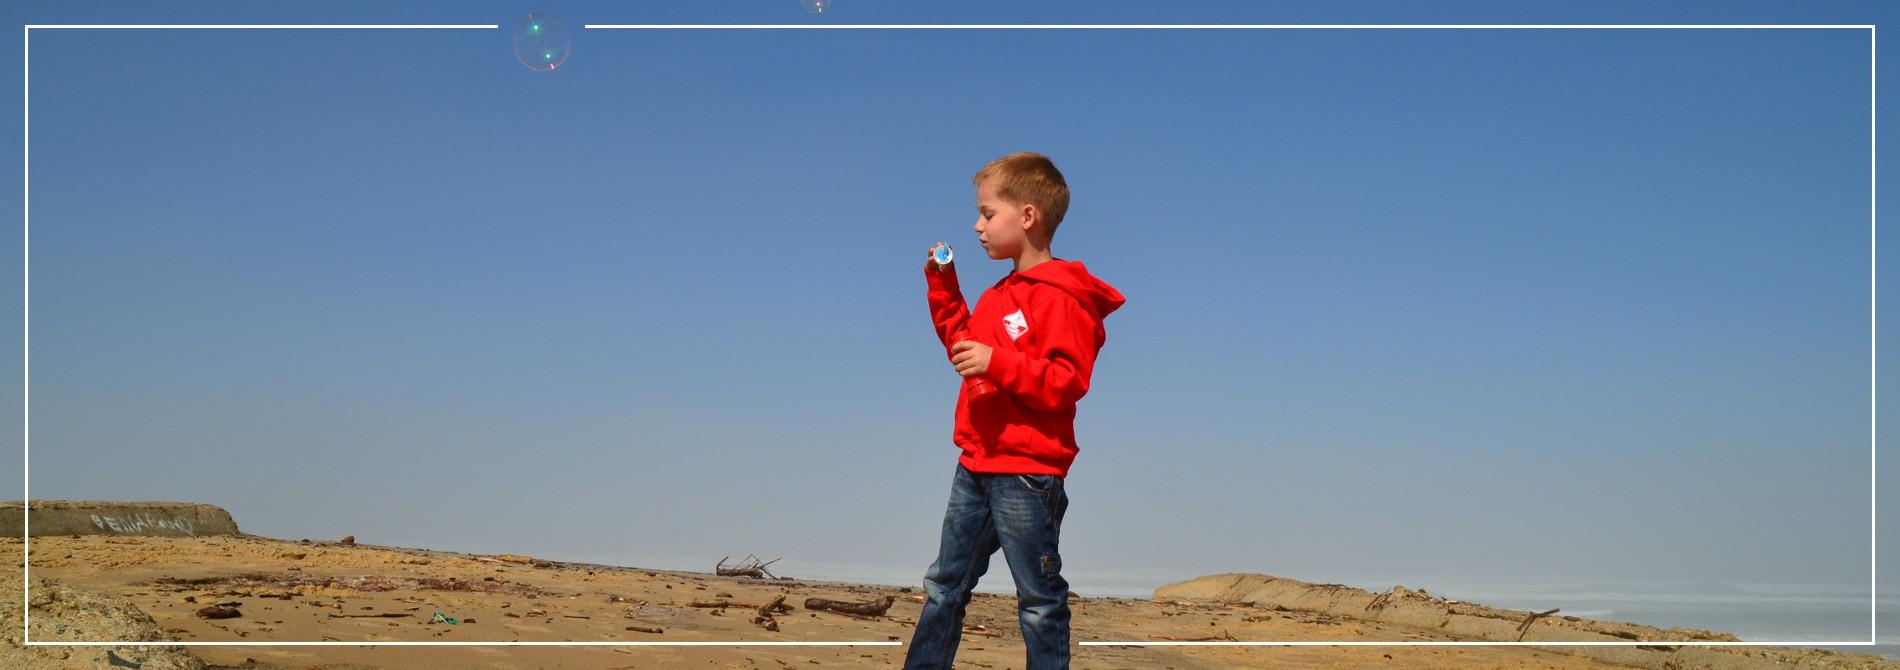 Sweat Enfant Beach Lifeguard Hossegor